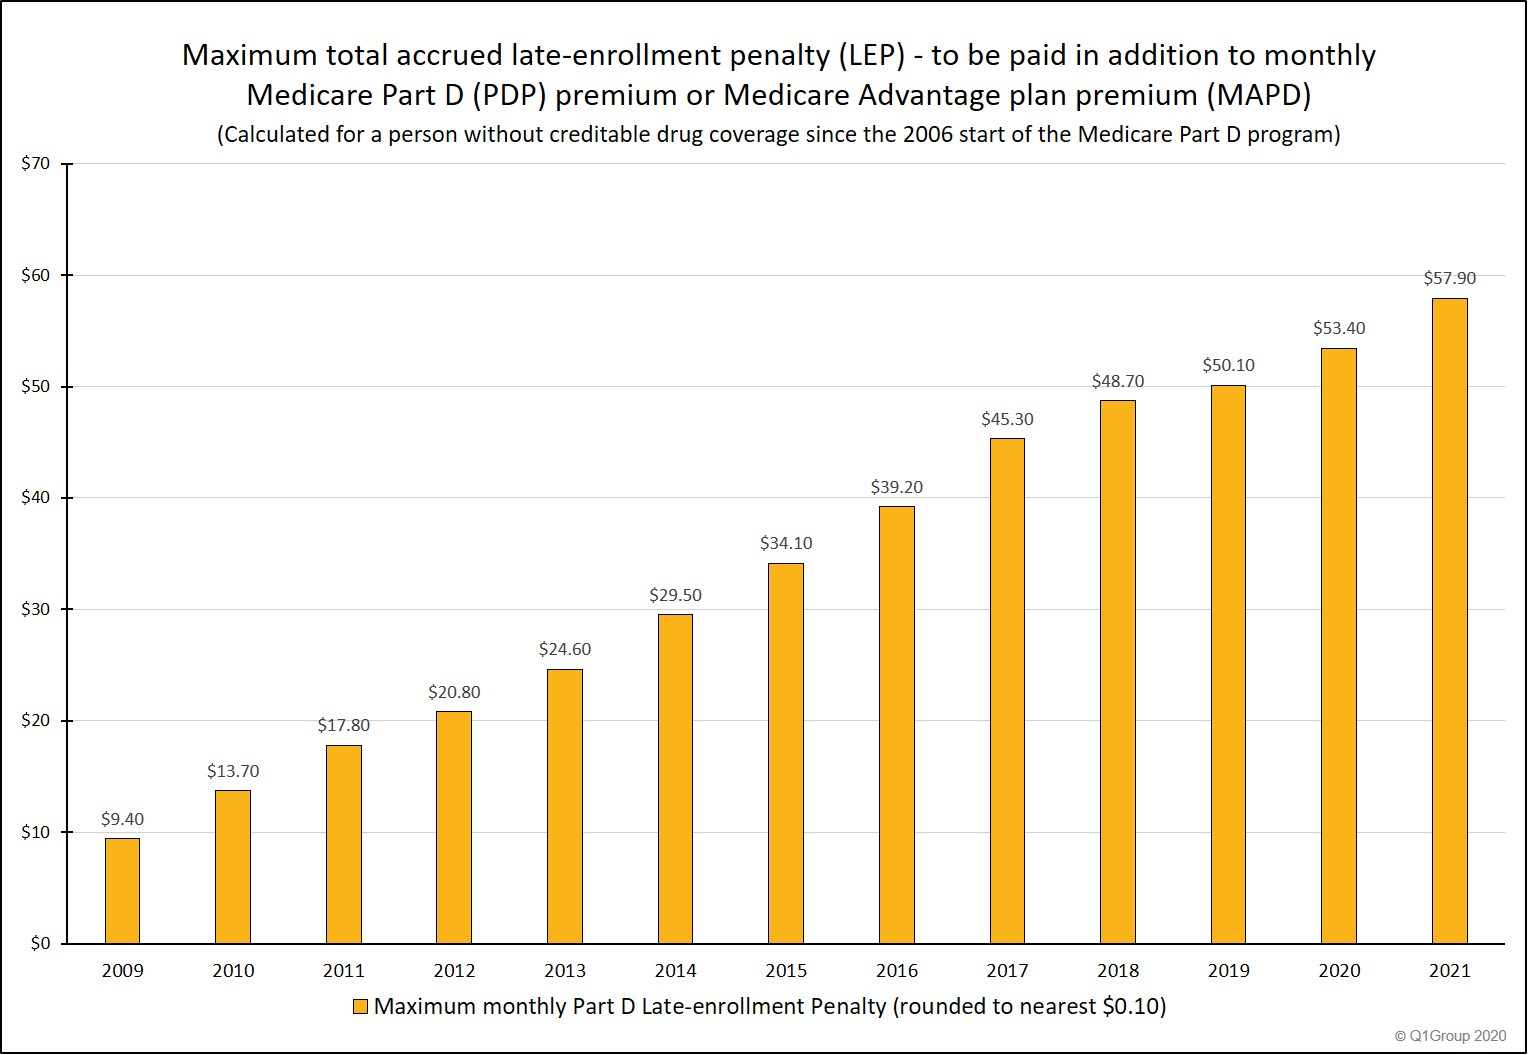 2021_Maximum_Medicare_Part D_Late_Enrollment_Penalty